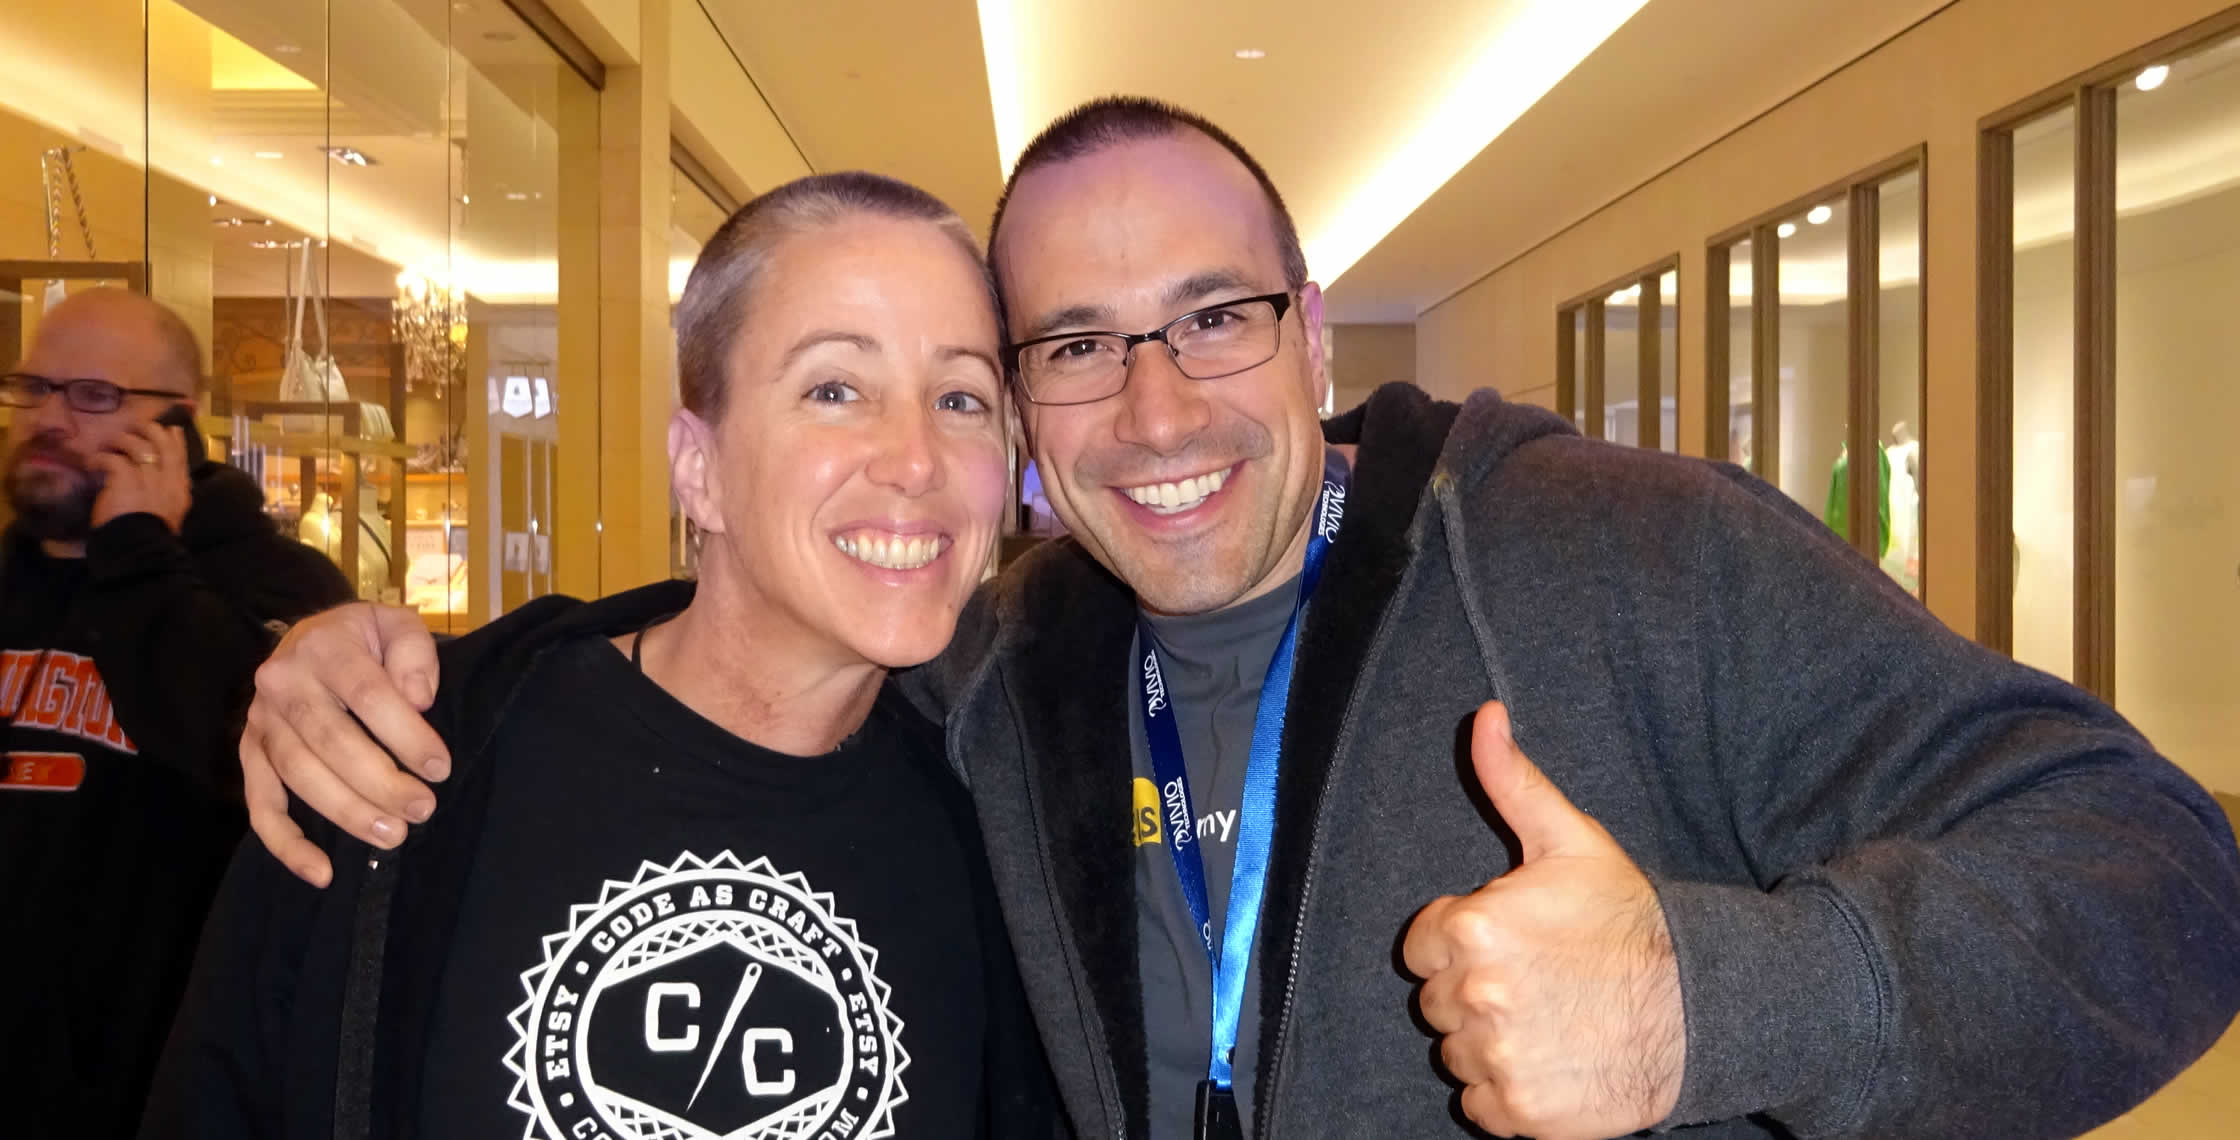 Ben Nadel at dev.Objective() 2015 (Bloomington, MN) with: Kitt Hodsden